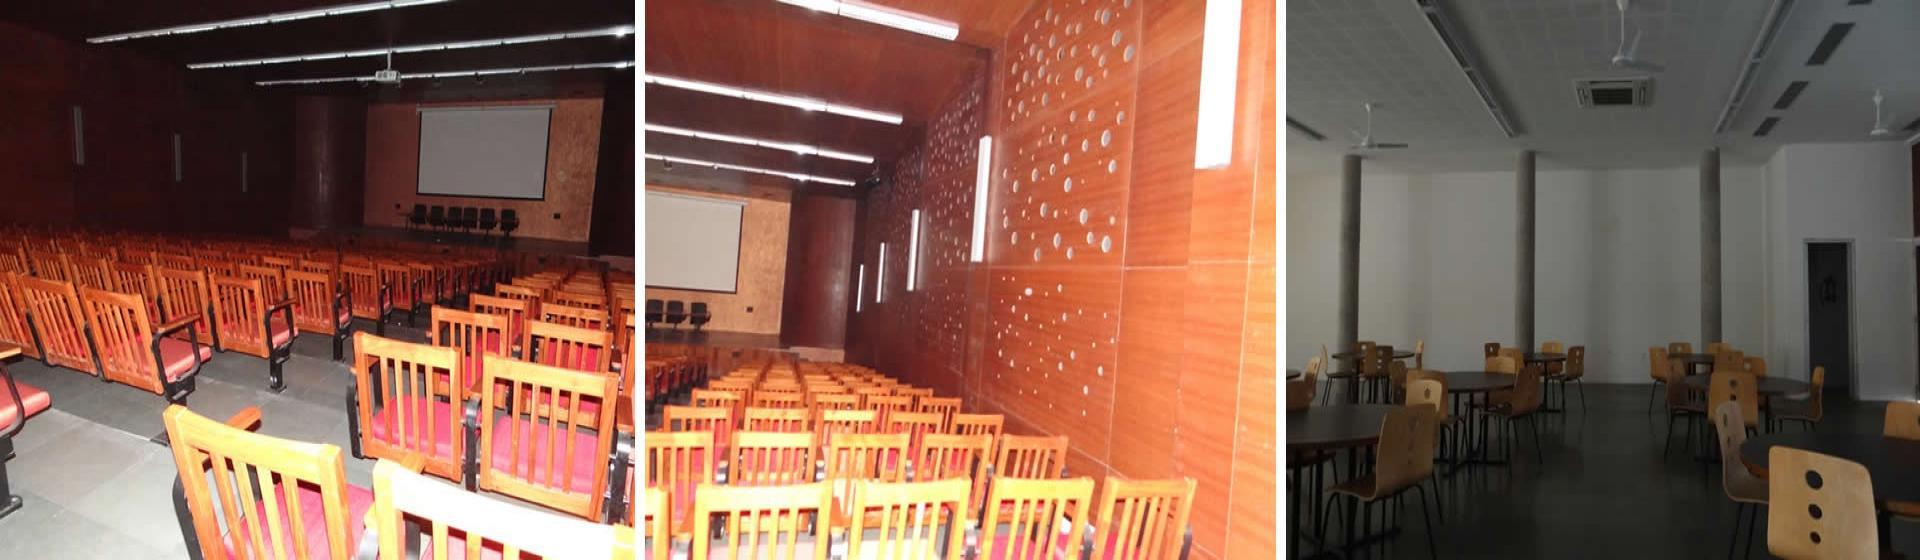 Seminar Hall Image - 2